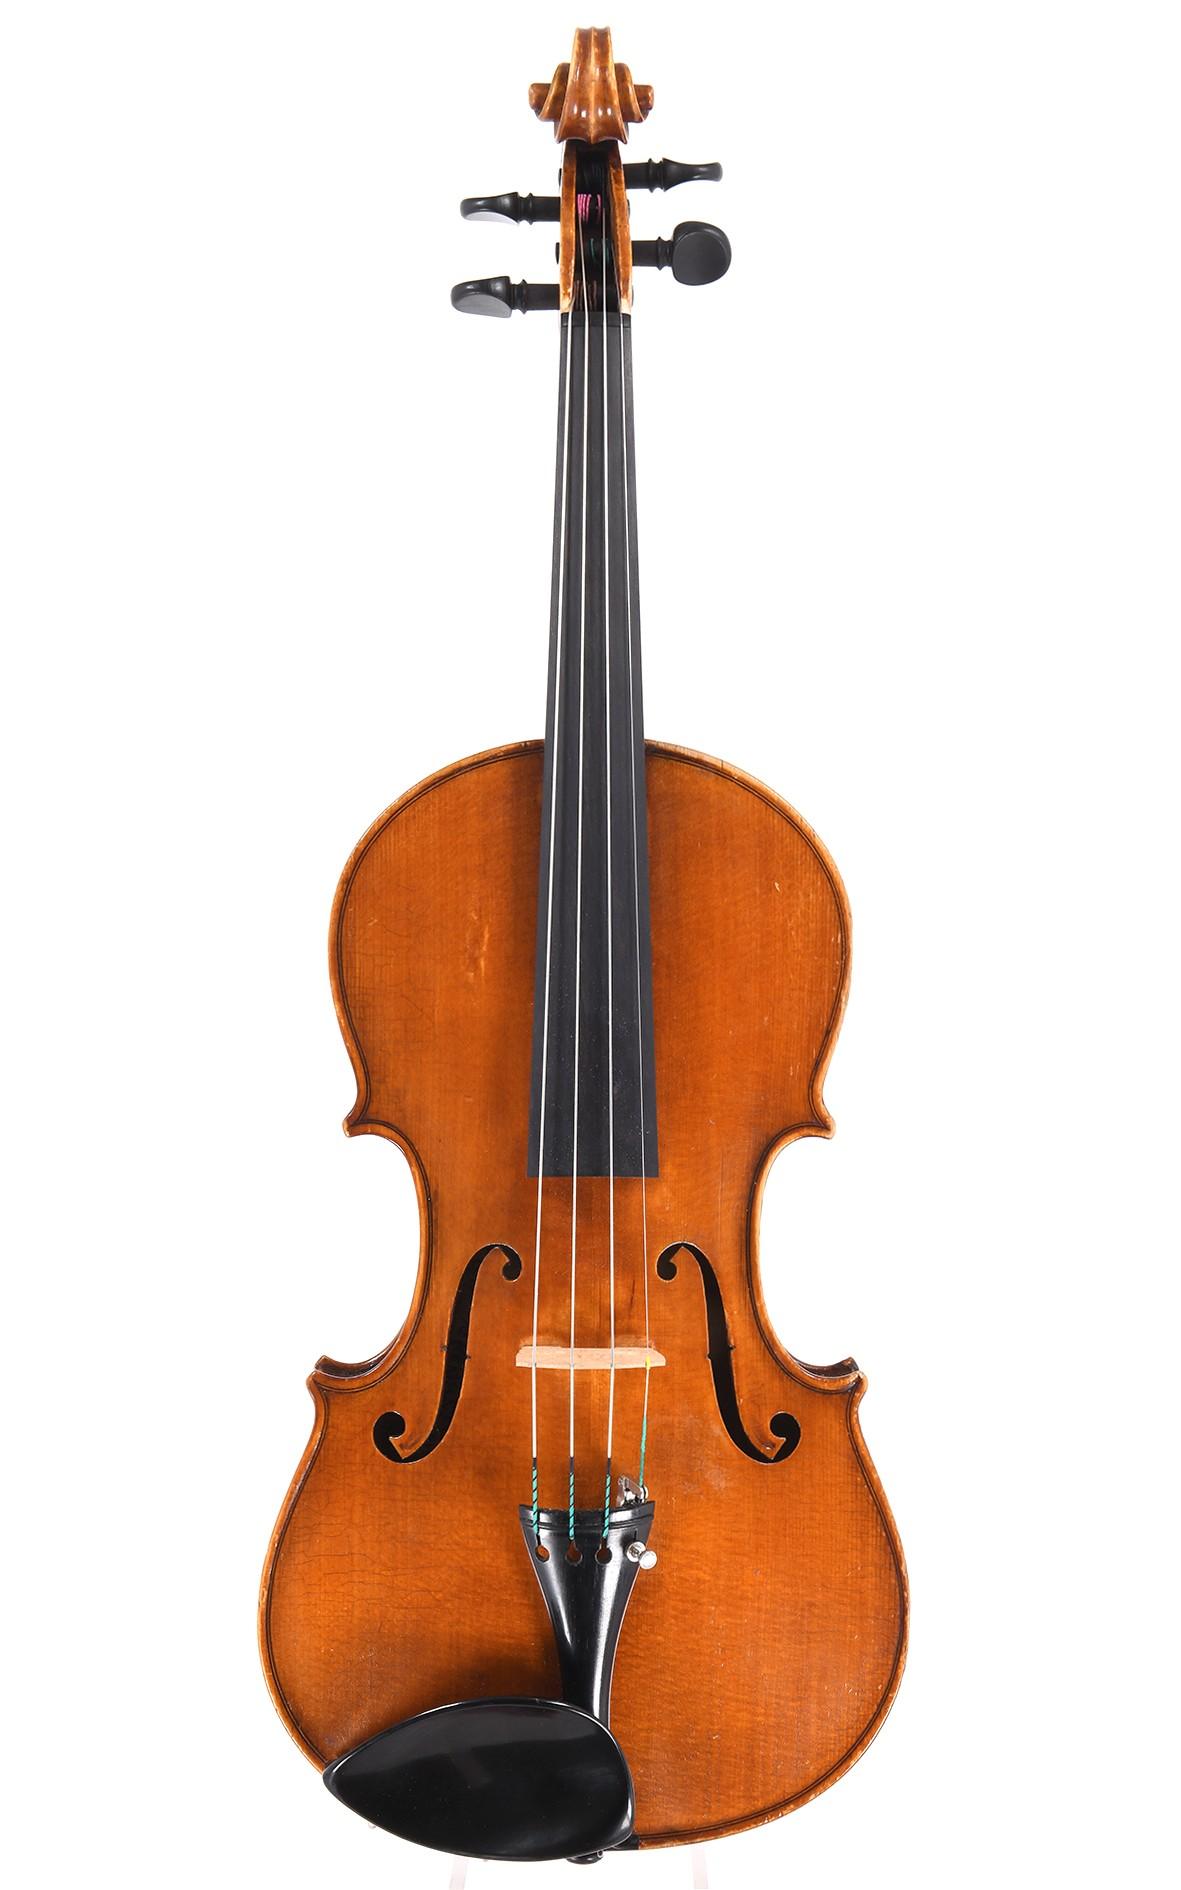 Italian violin from the Officina Claudio Monteverde, Cremona